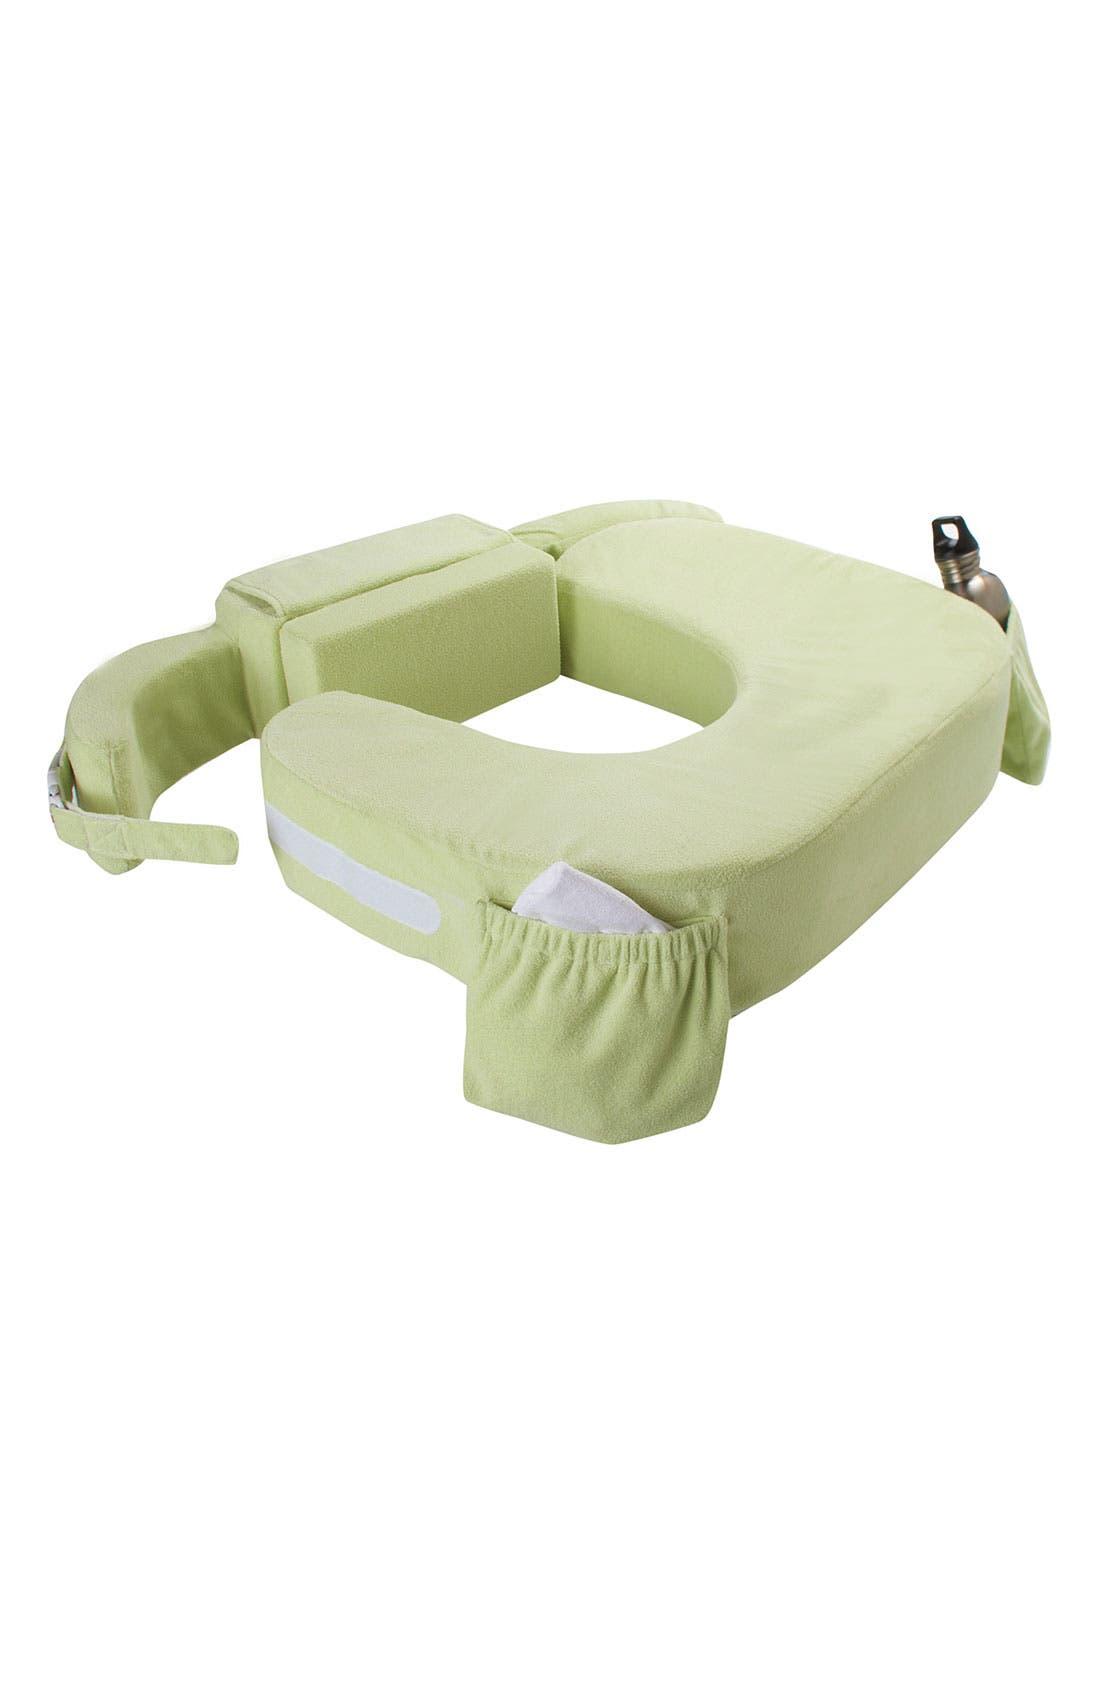 Alternate Image 1 Selected - My Brest Friend Twins Nursing Pillow